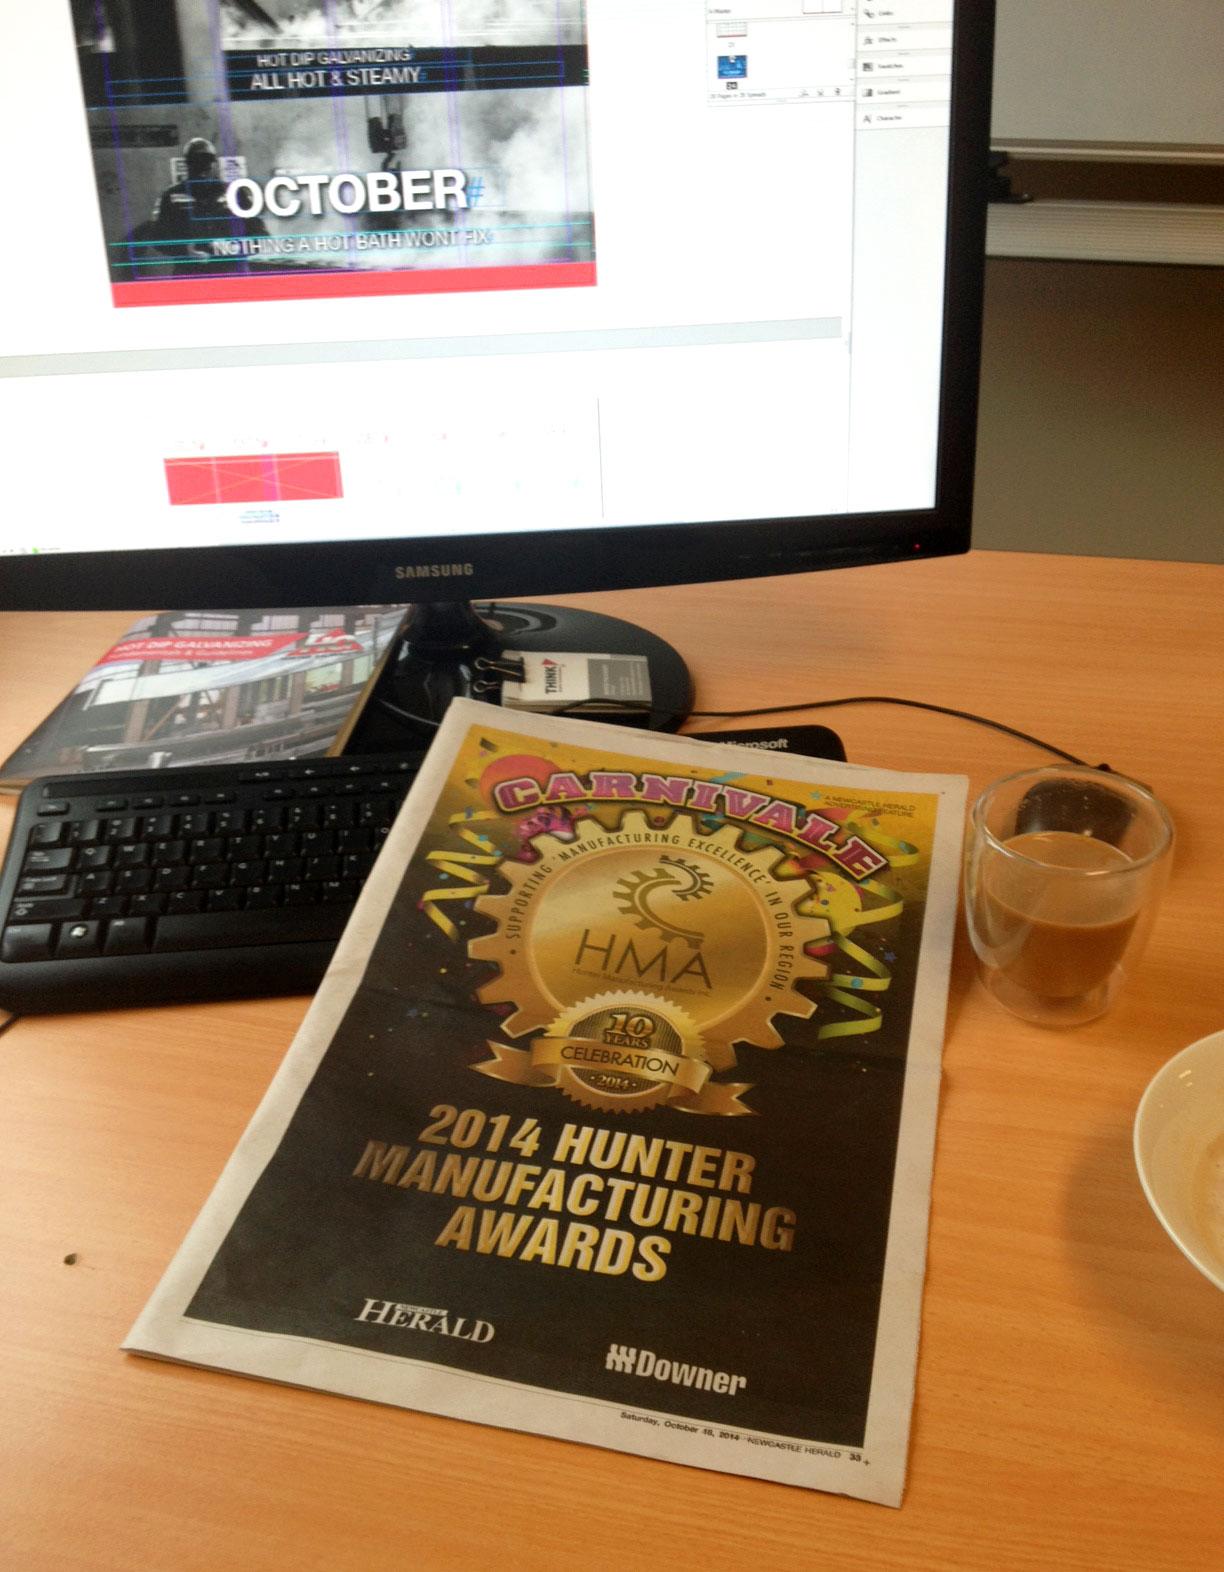 2014 Hunter Manufacturing Awards